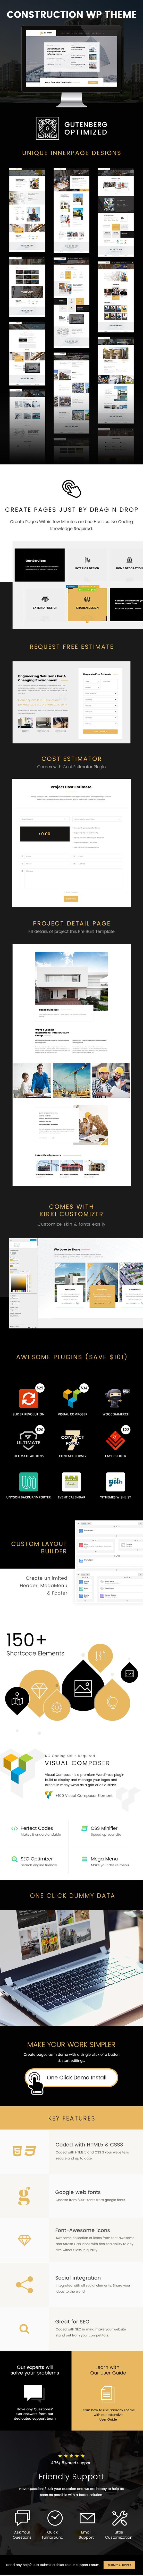 Saaram Bau, Architekt WordPress Theme - 1